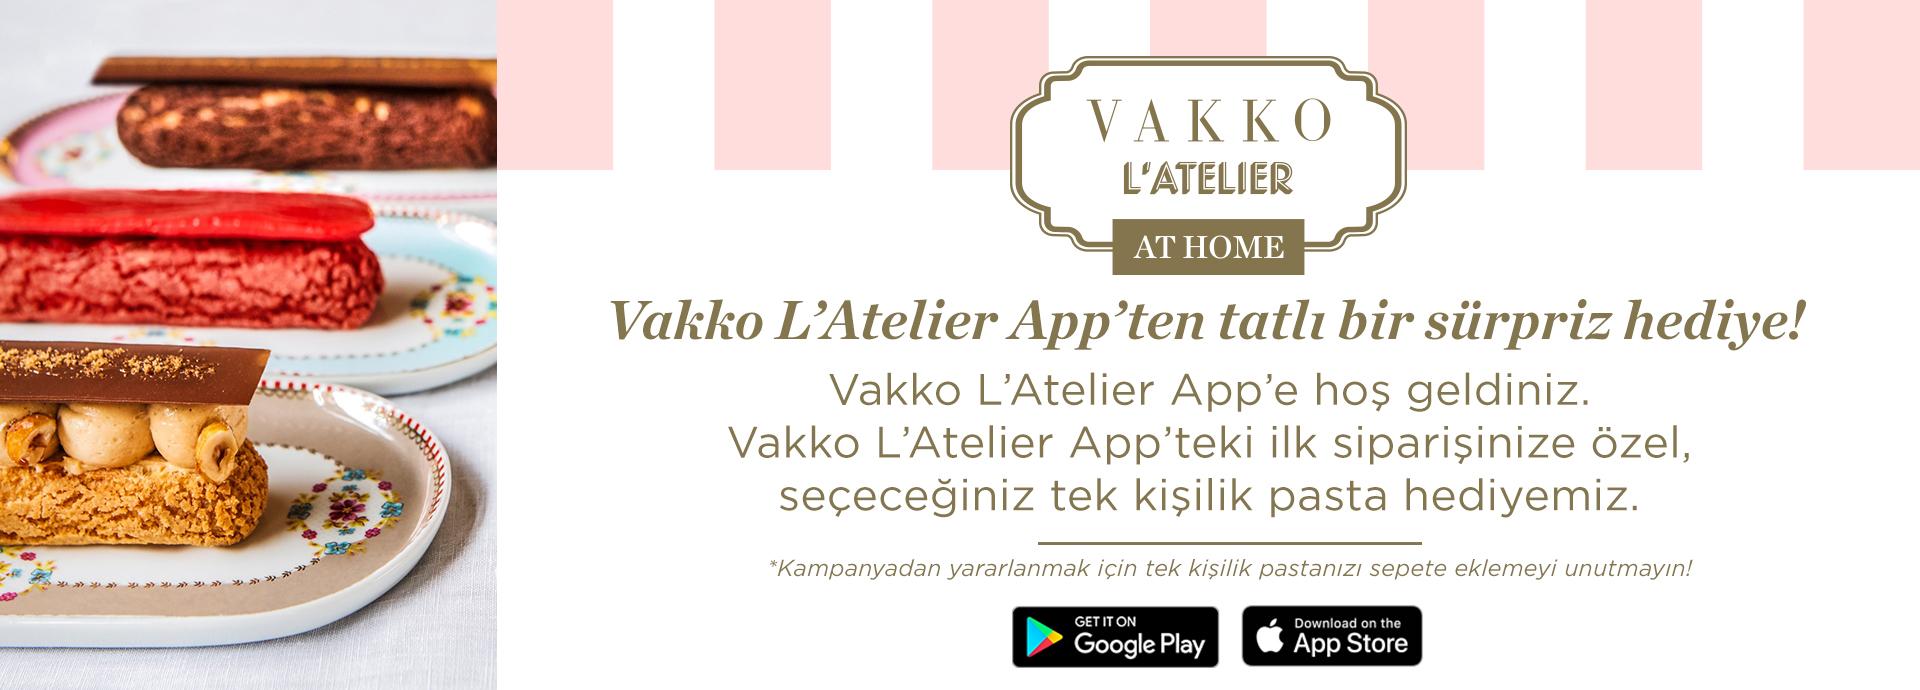 vakko_latelier_app_kampanya_1920x690 wordpress TR